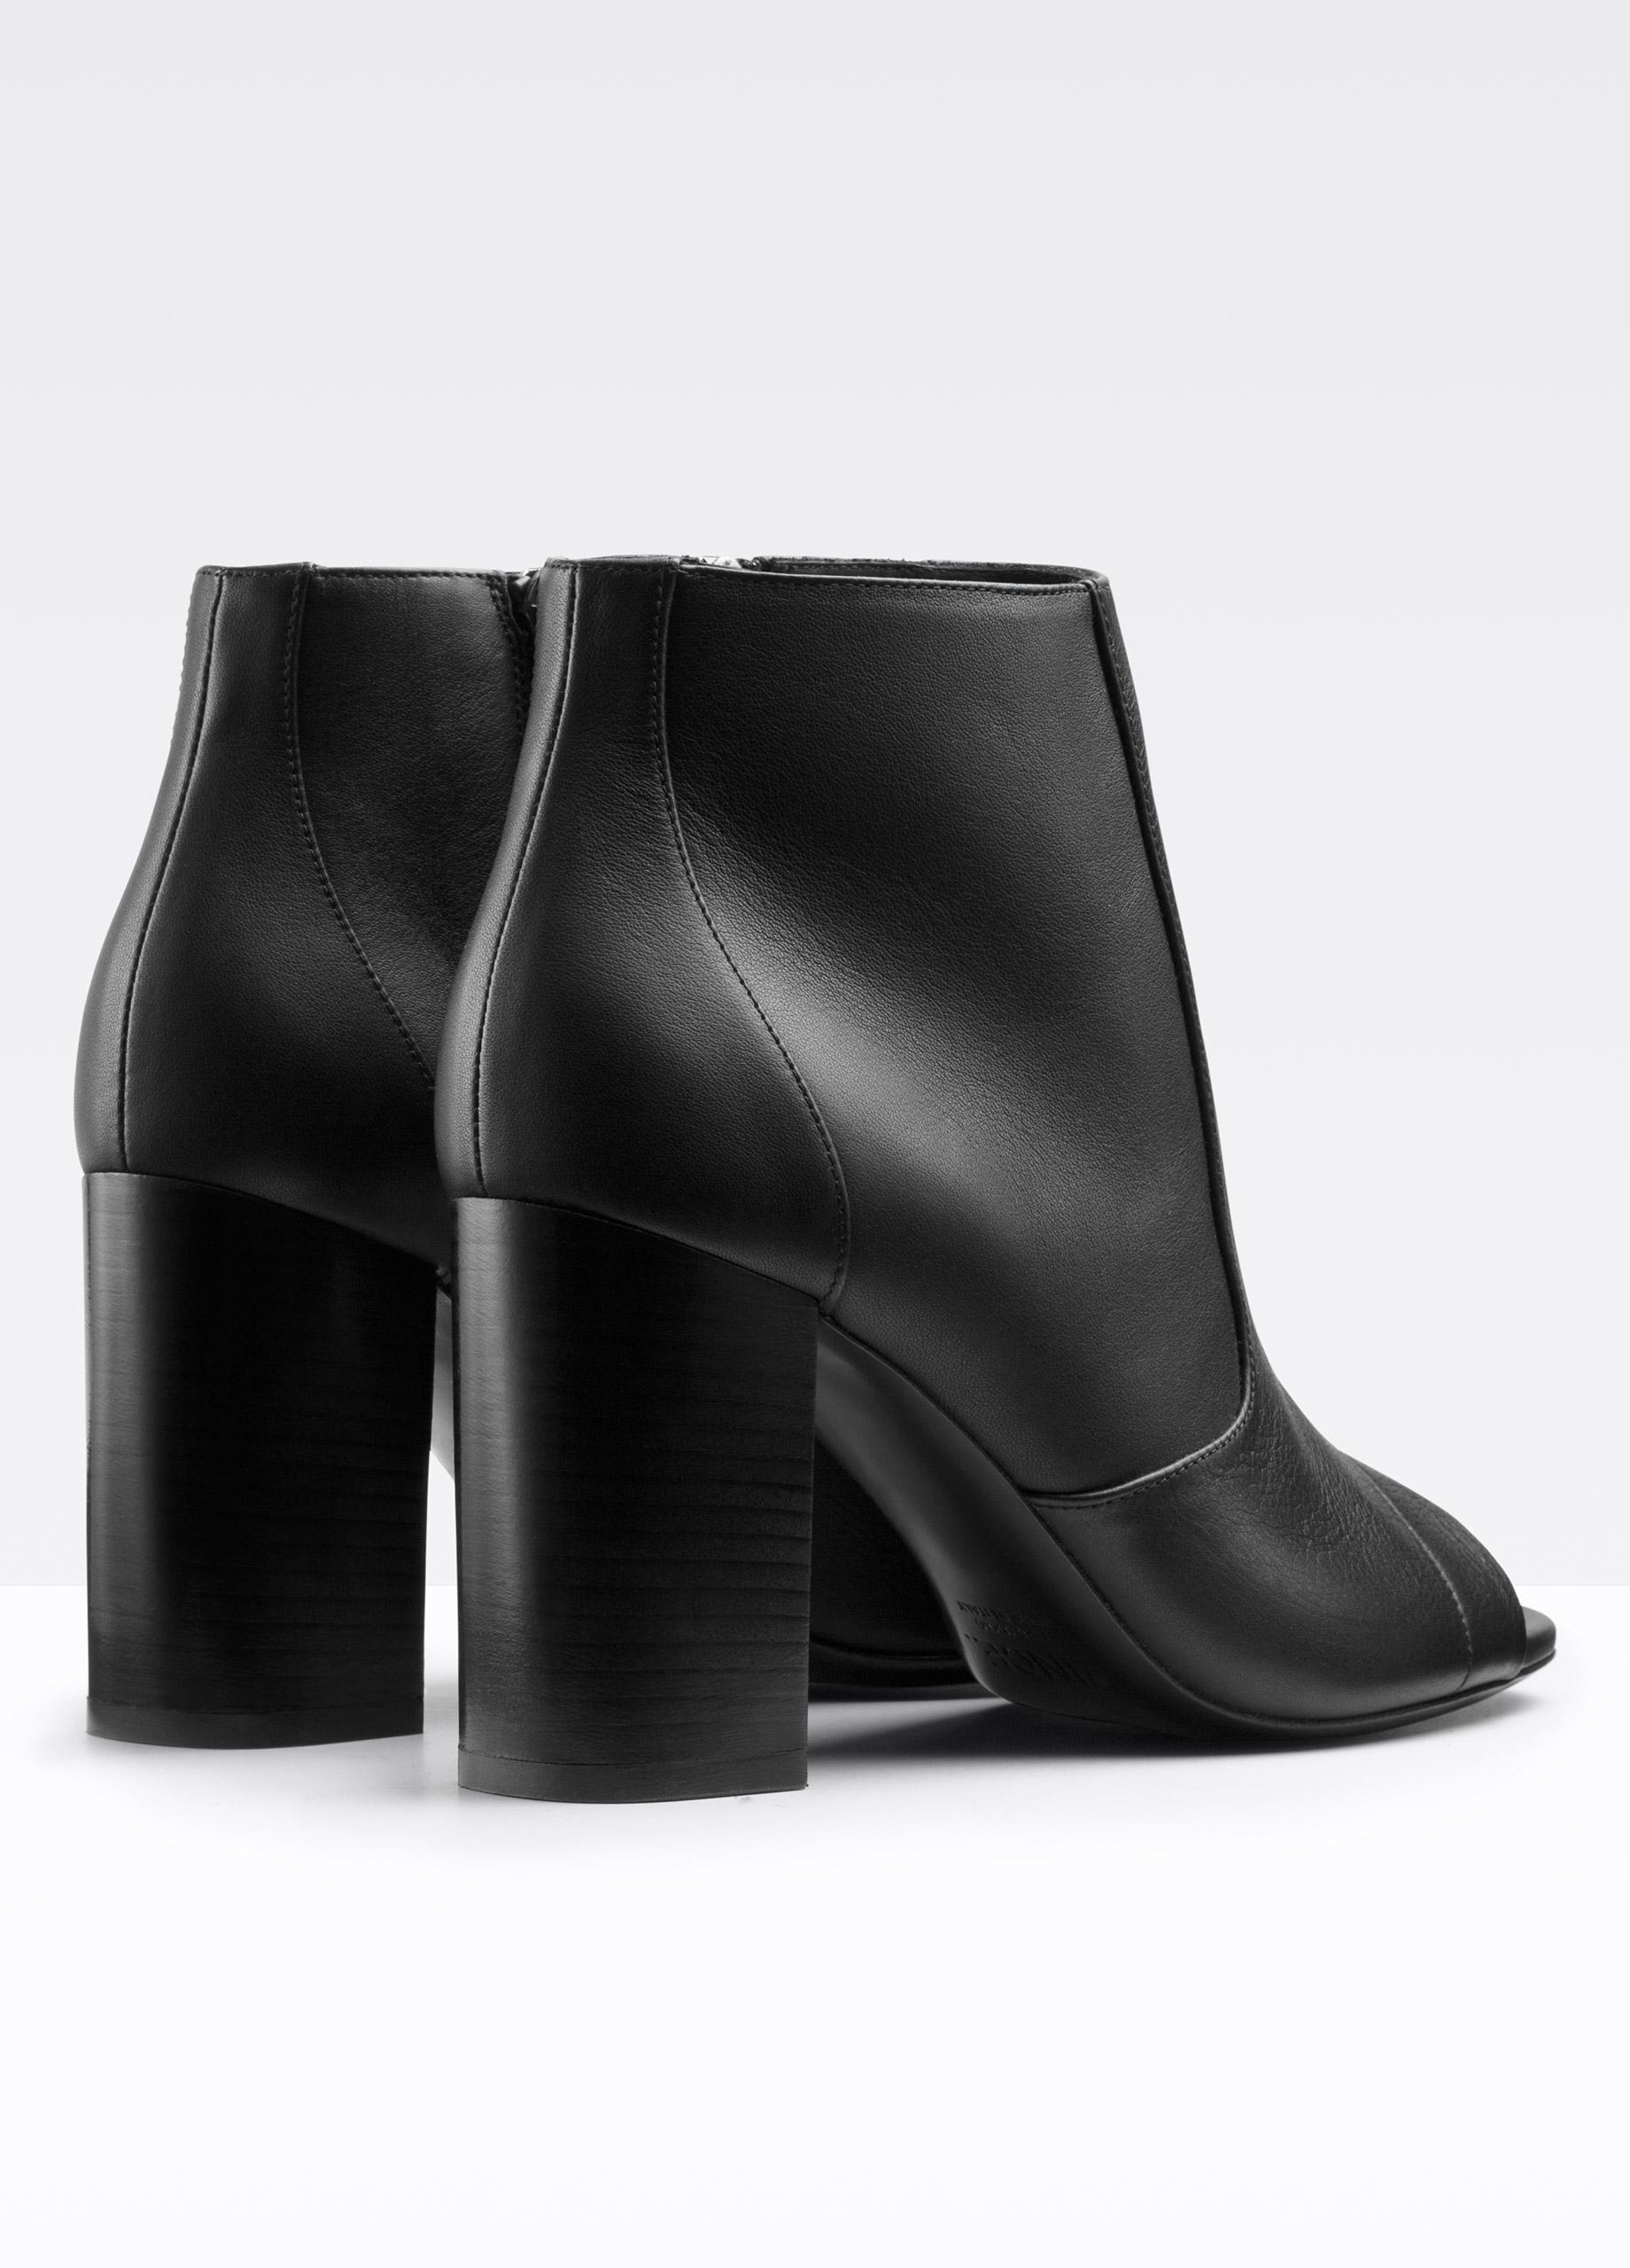 Lyst - Vince Fionn Peep-toe Leather Bootie in Black